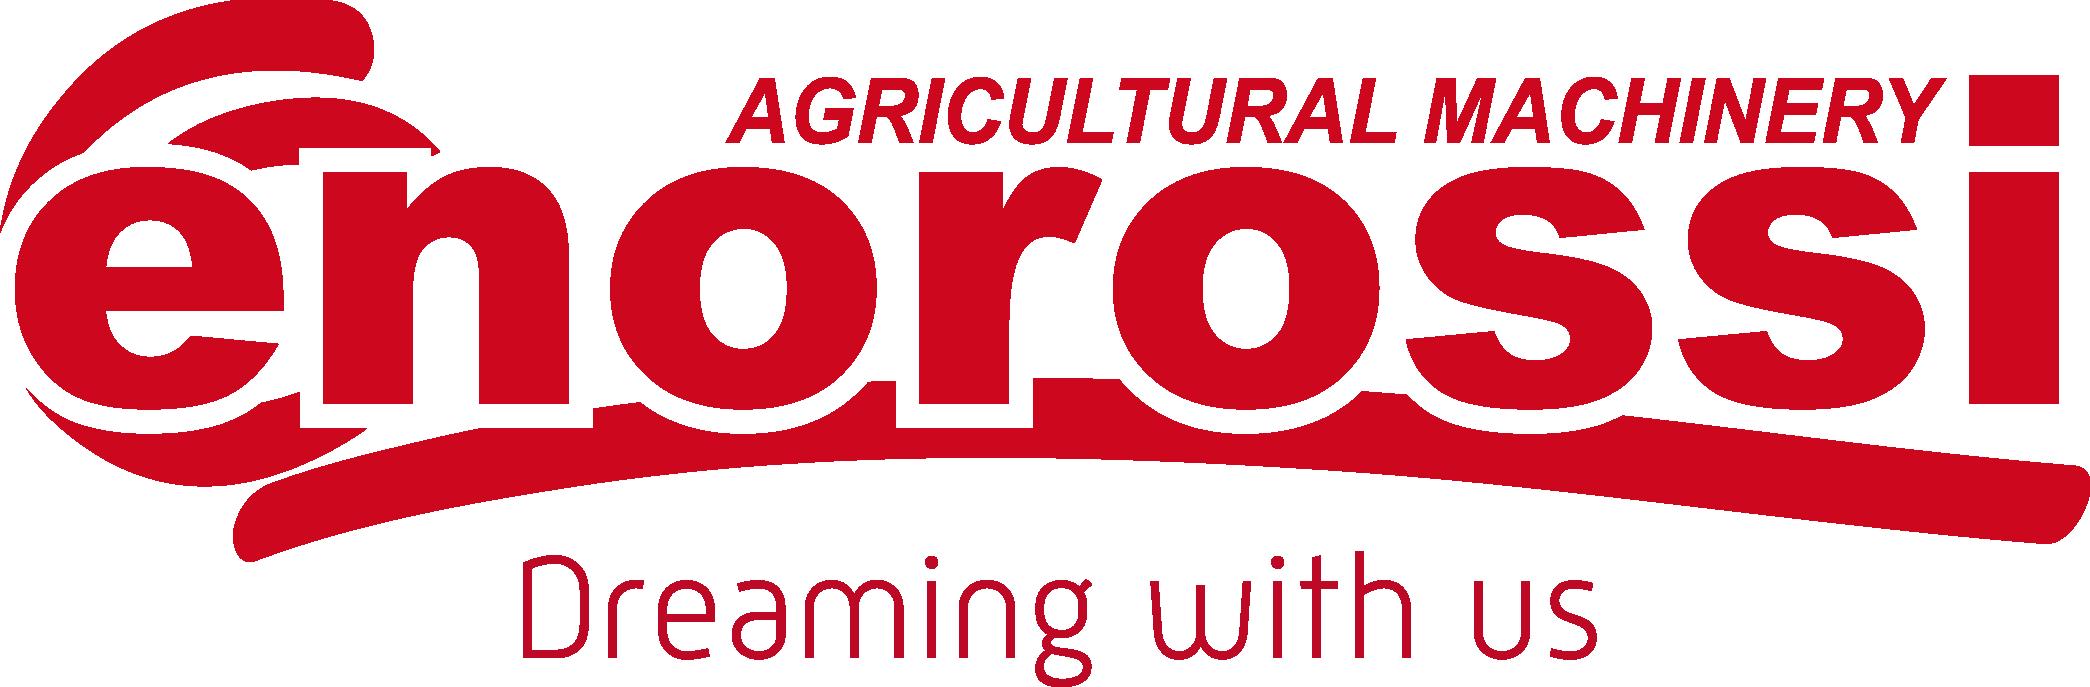 Logo Enorossi